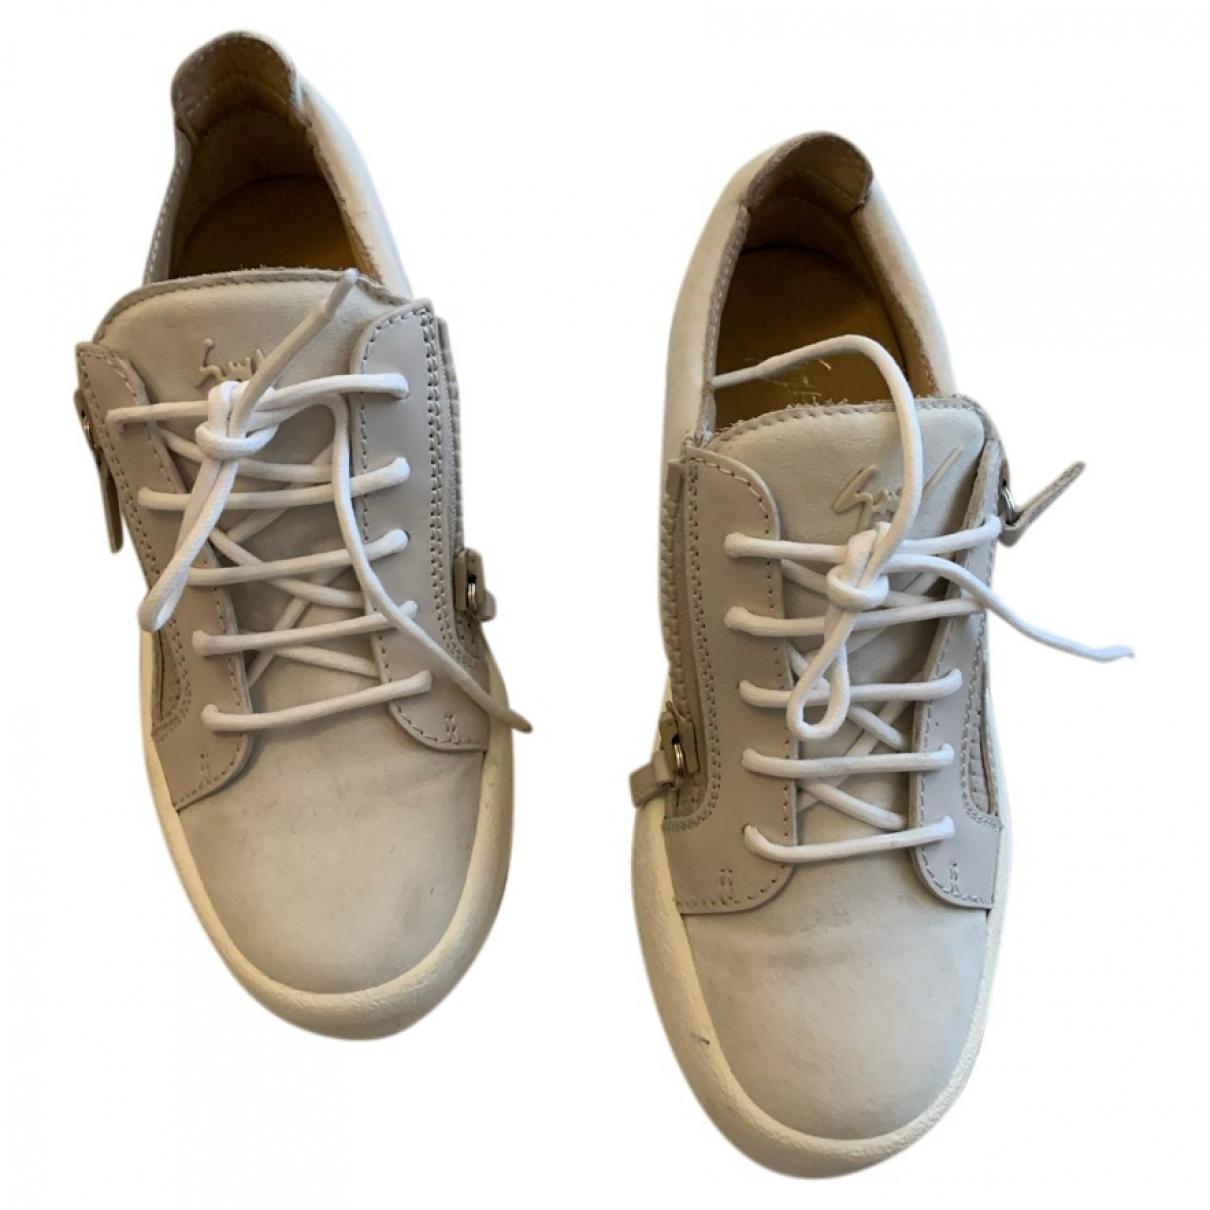 Giuseppe Zanotti - Baskets Nicki pour femme en cuir - gris